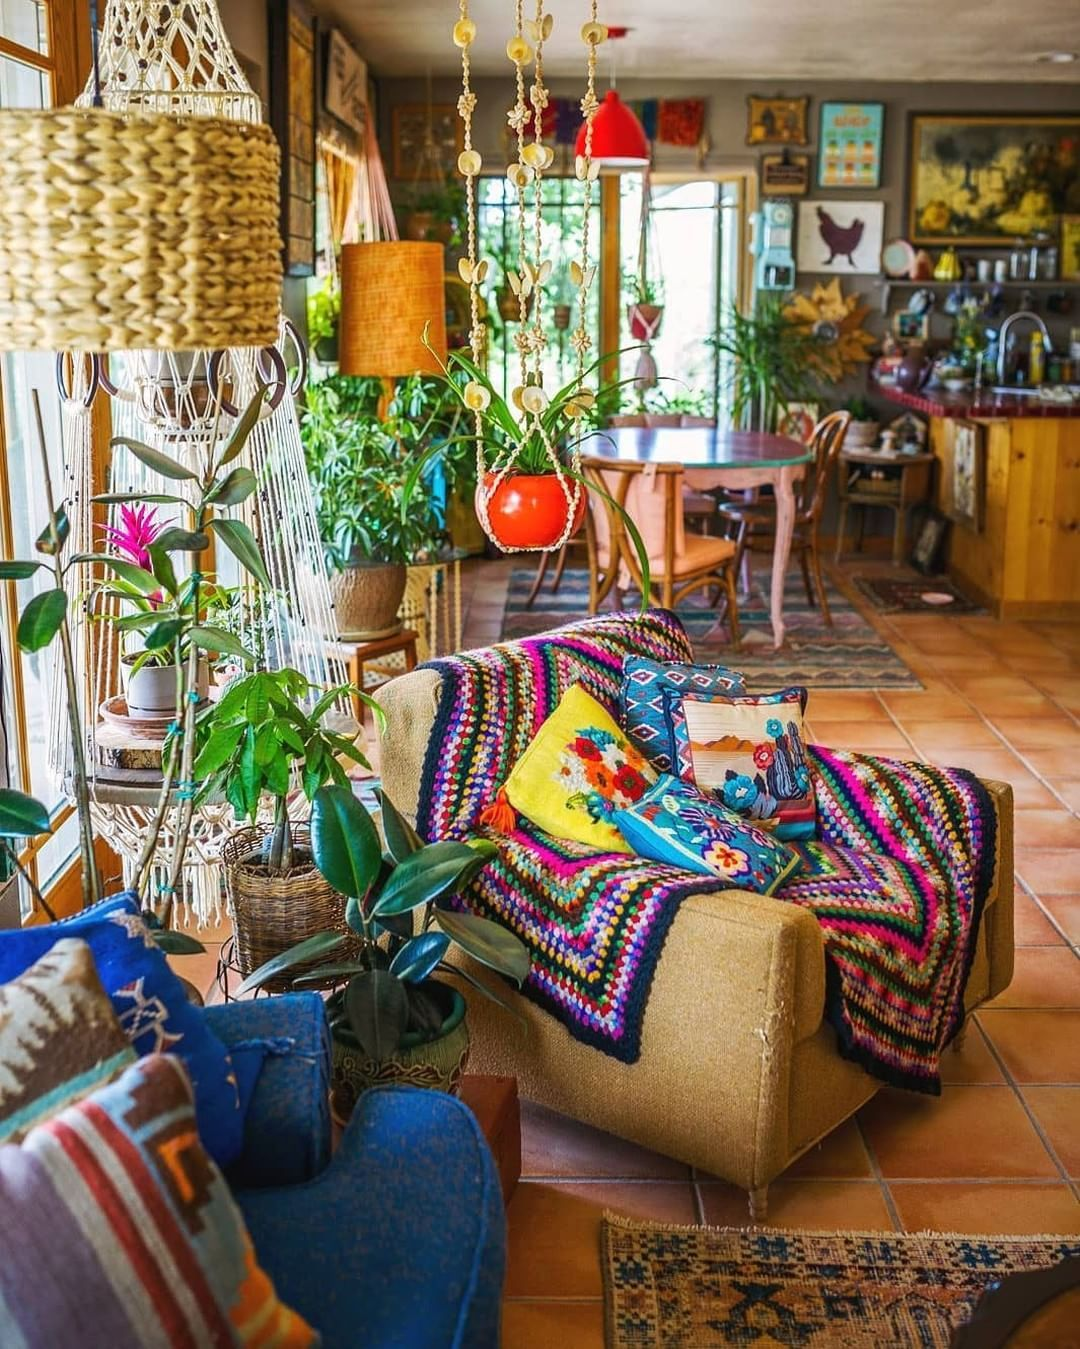 Pin by Paula Usemuckel on Boho Style Decor   Home decor, Home ...